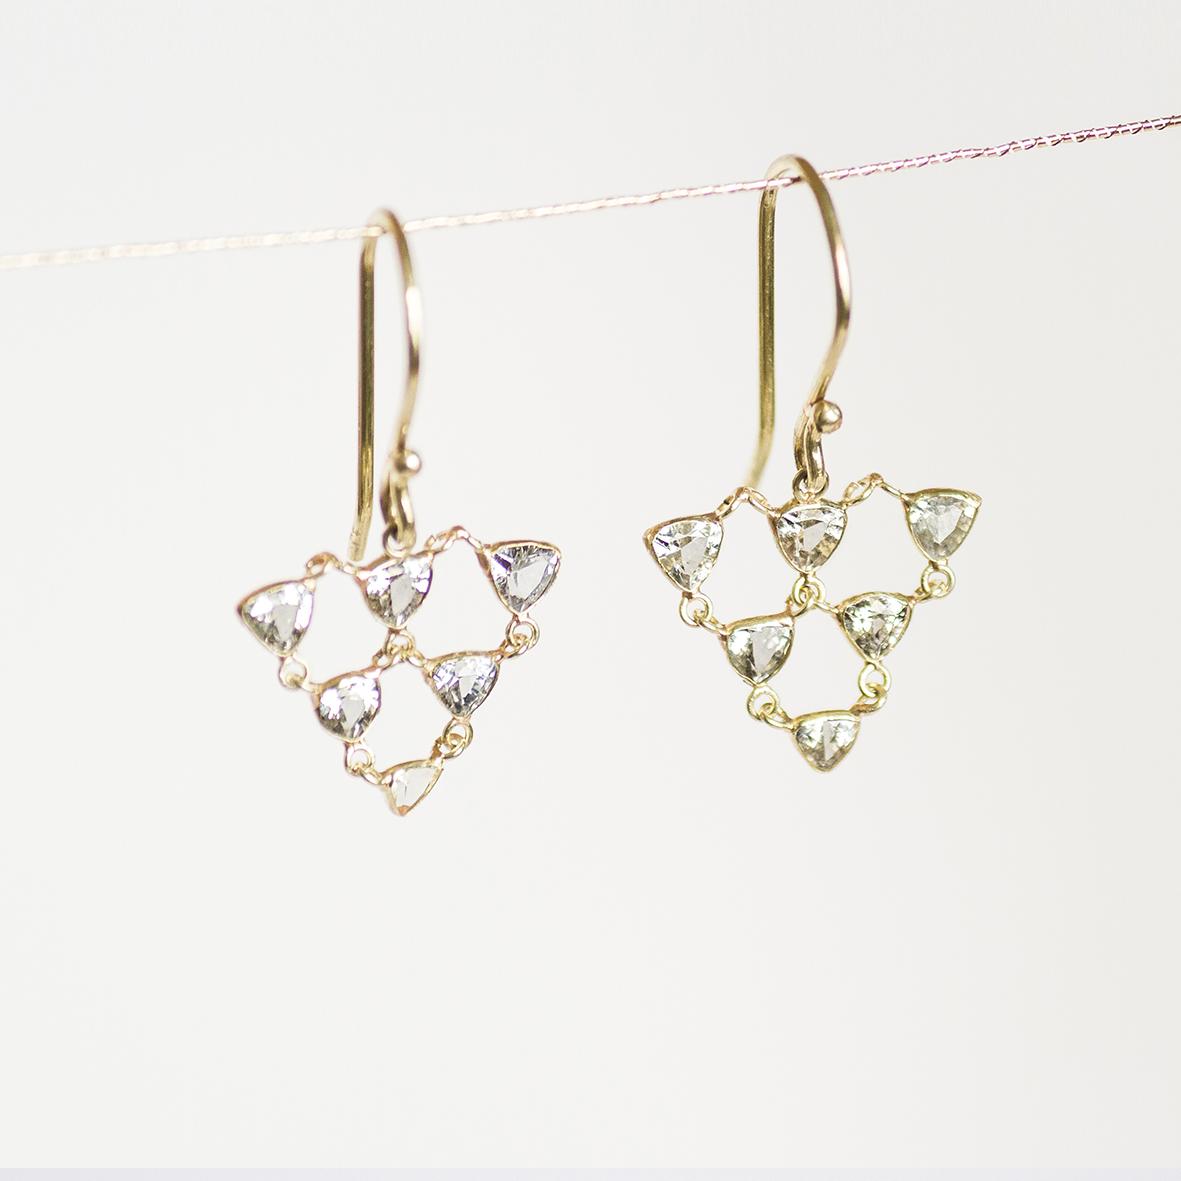 3. OONA_philo_principal_sapphire triangle earrings